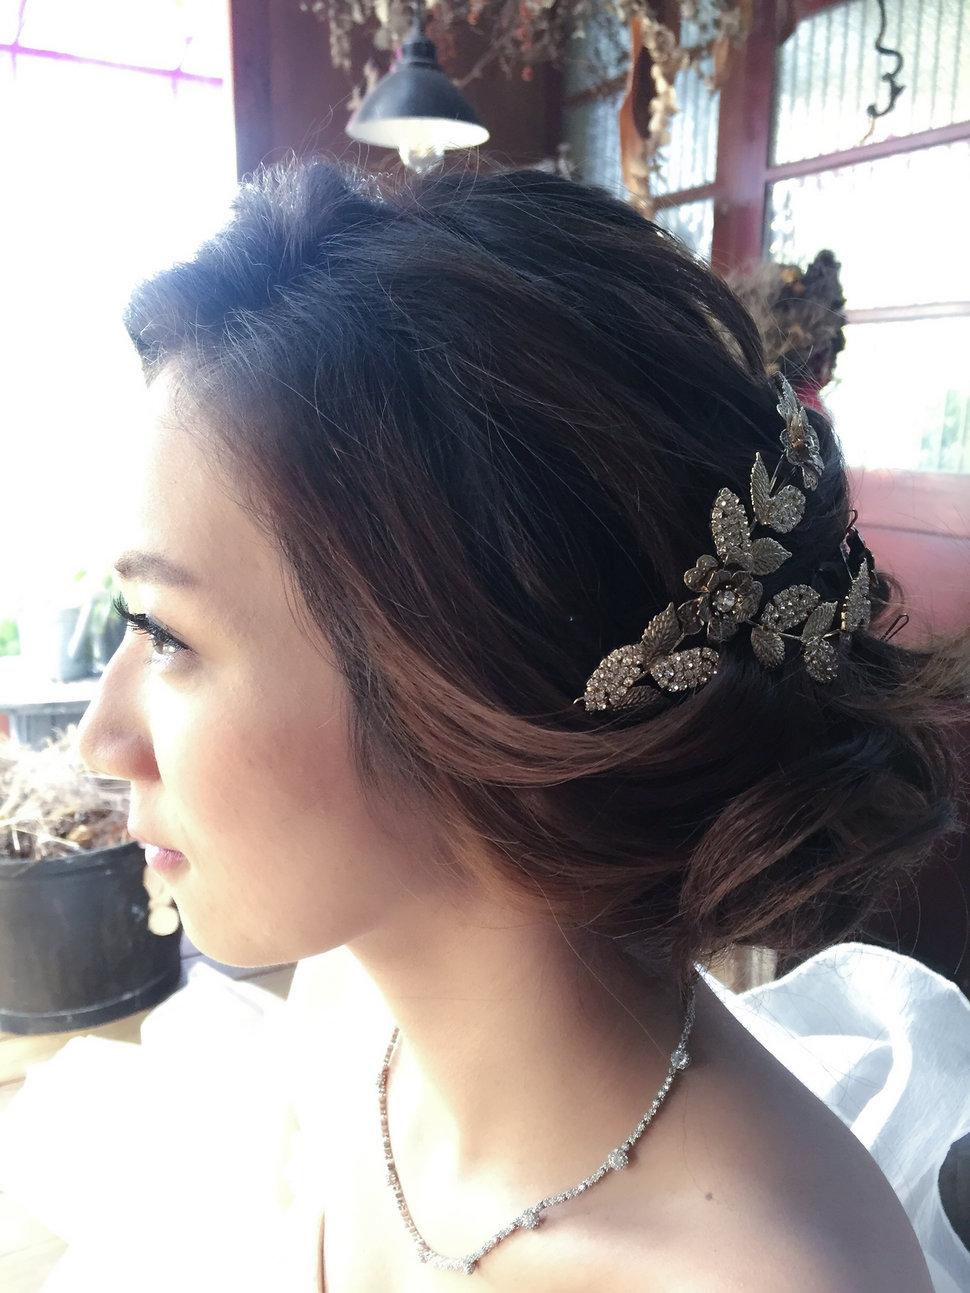 IMG_3483 - Jojo chen Makeup新娘秘書《結婚吧》